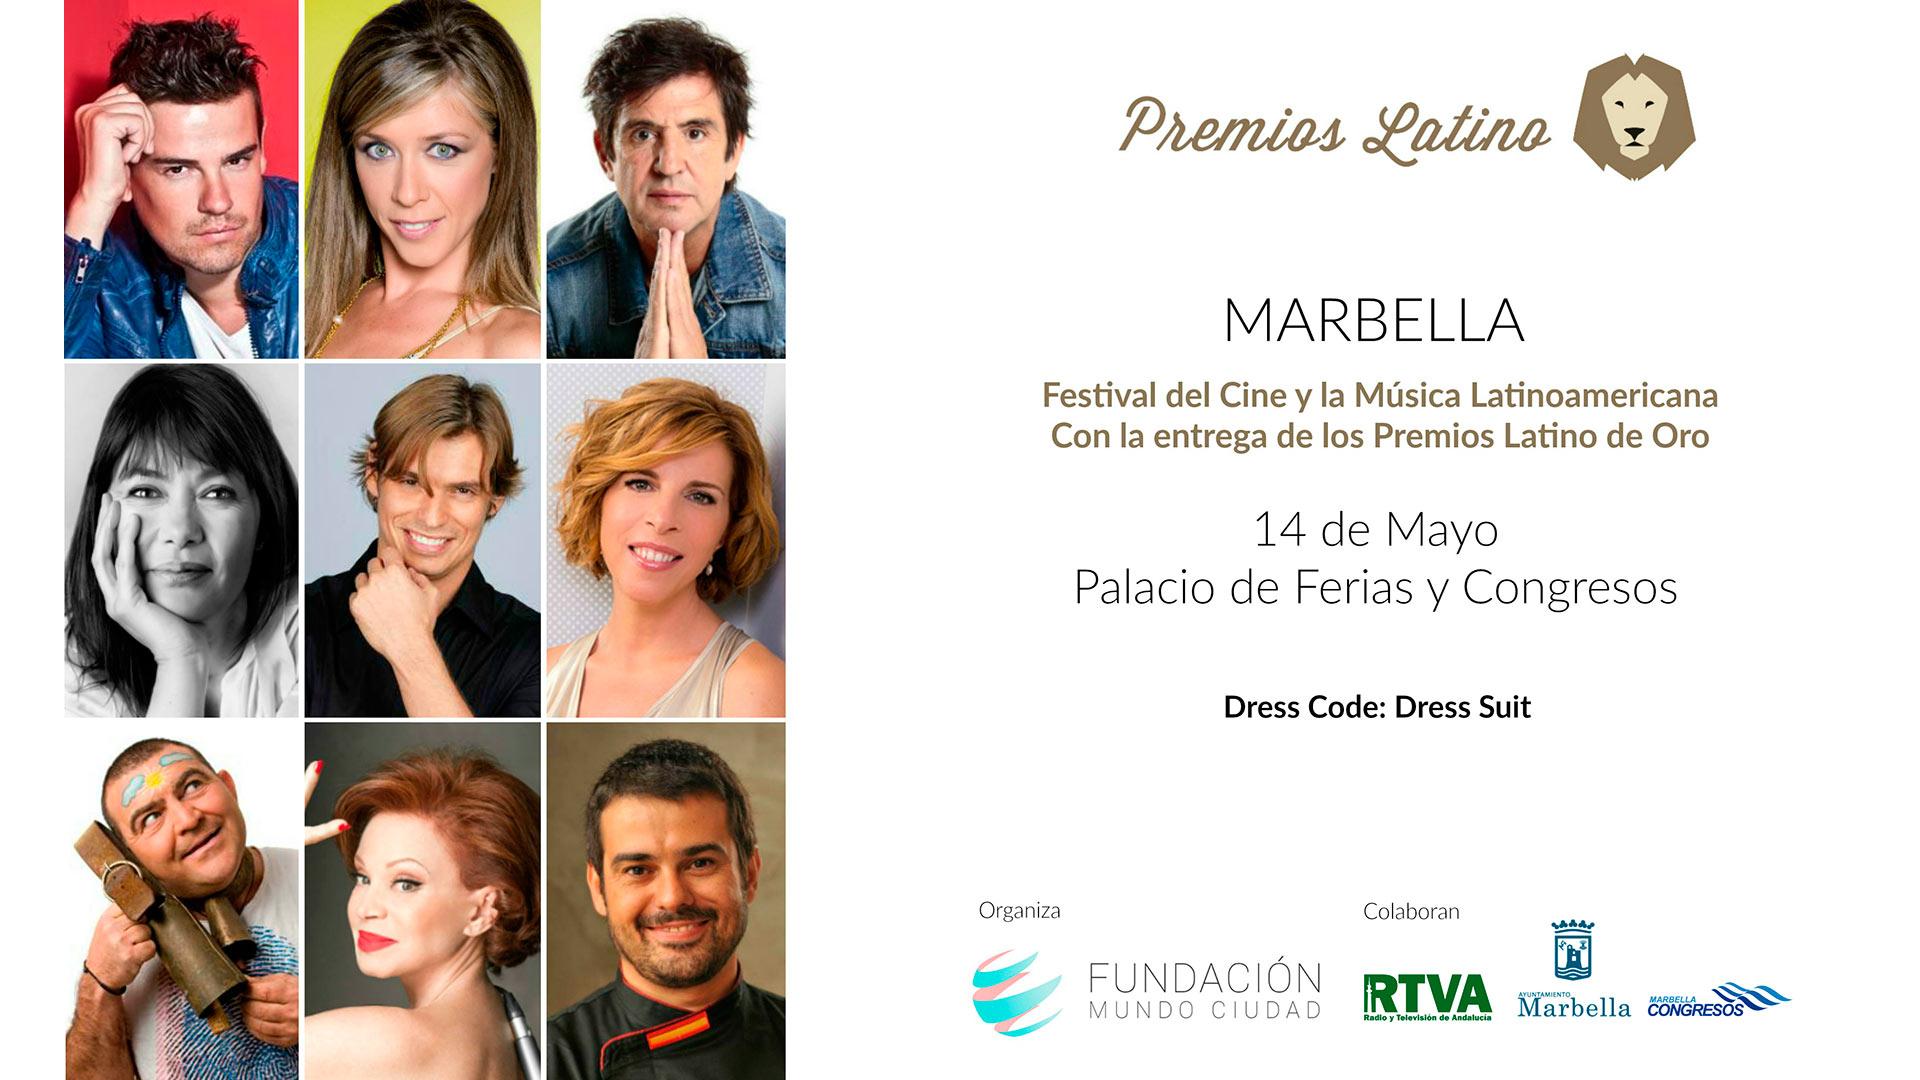 PREMIOS LATINO - www.premioslatino.es